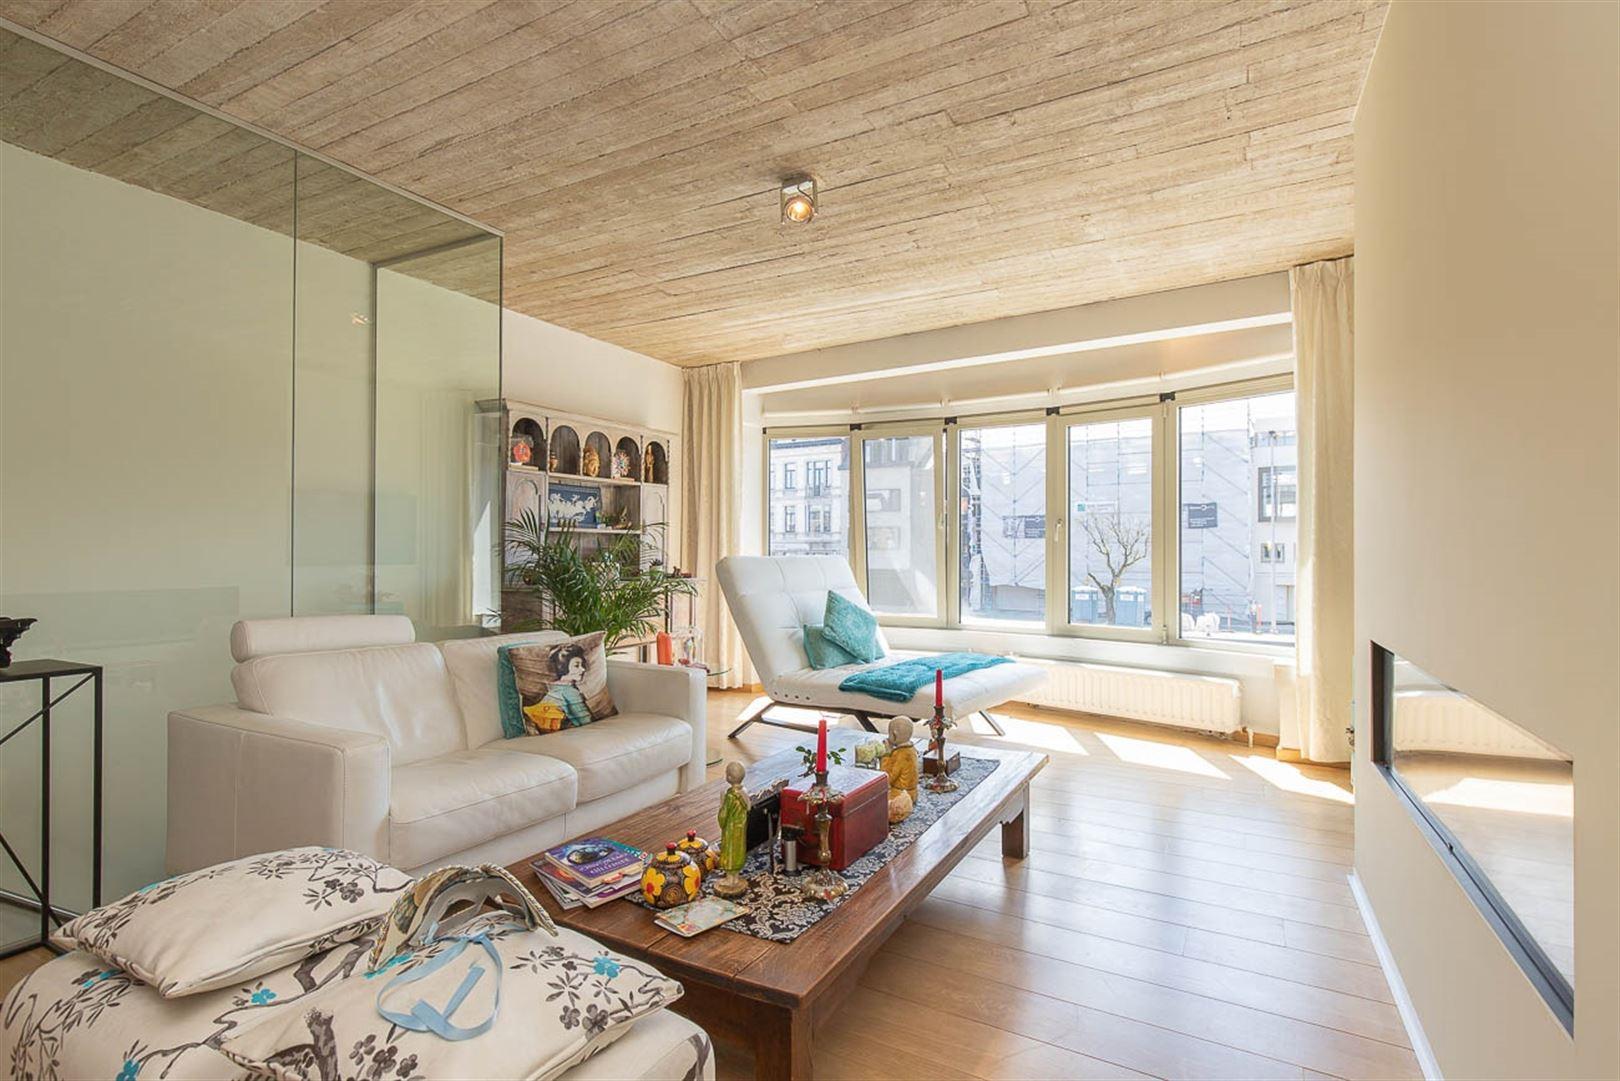 Foto 3 : Duplex/triplex te 9200 DENDERMONDE (België) - Prijs € 495.000